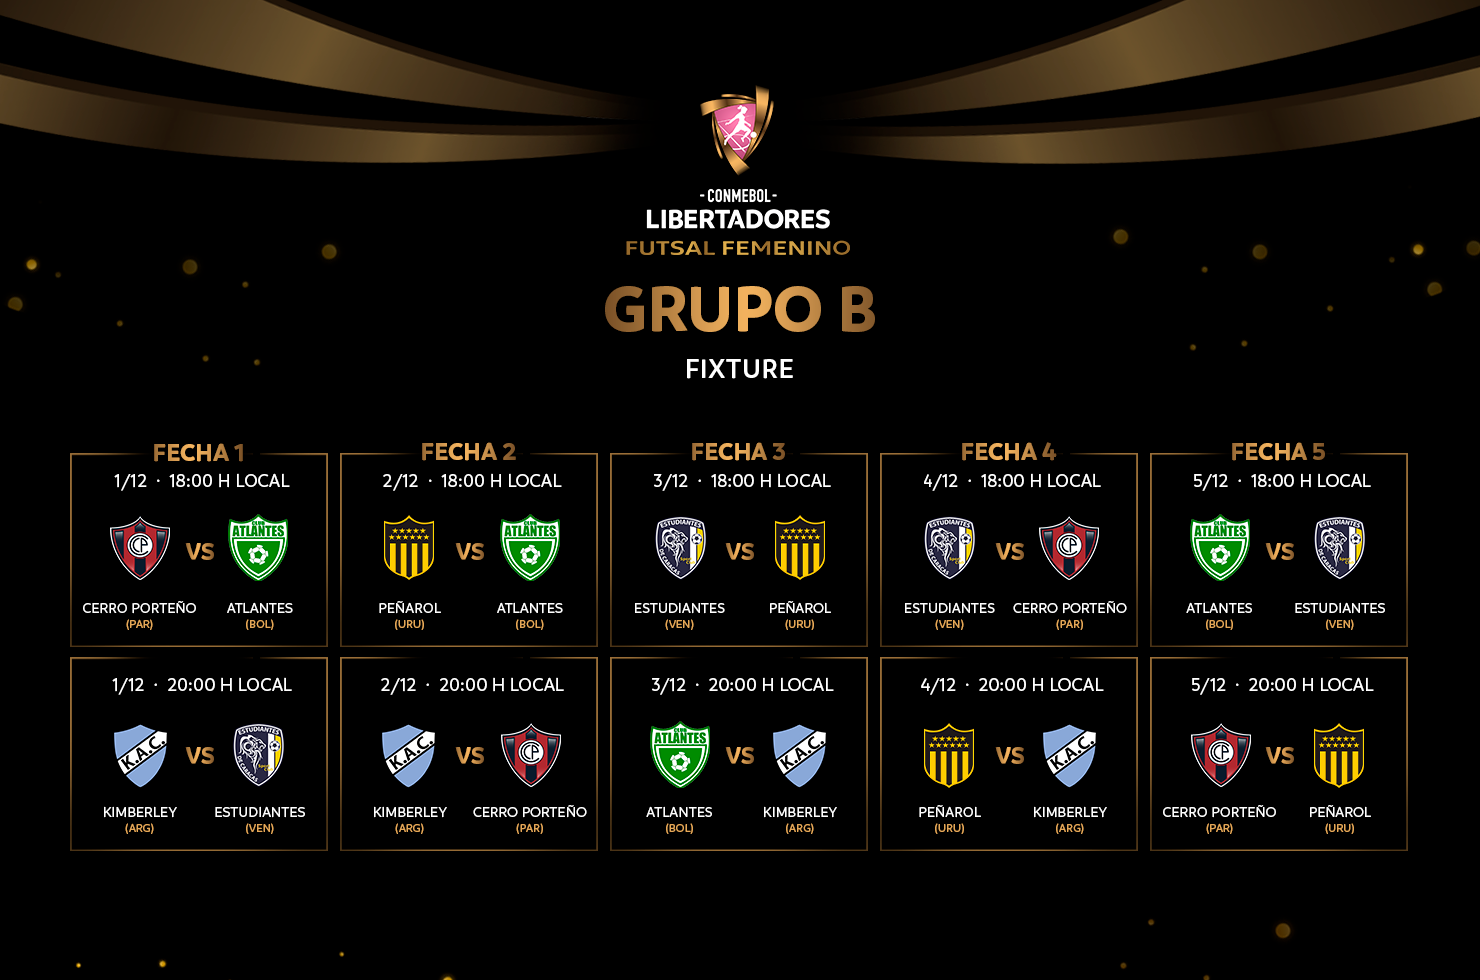 Grupos Libertadores Futsal Femenino